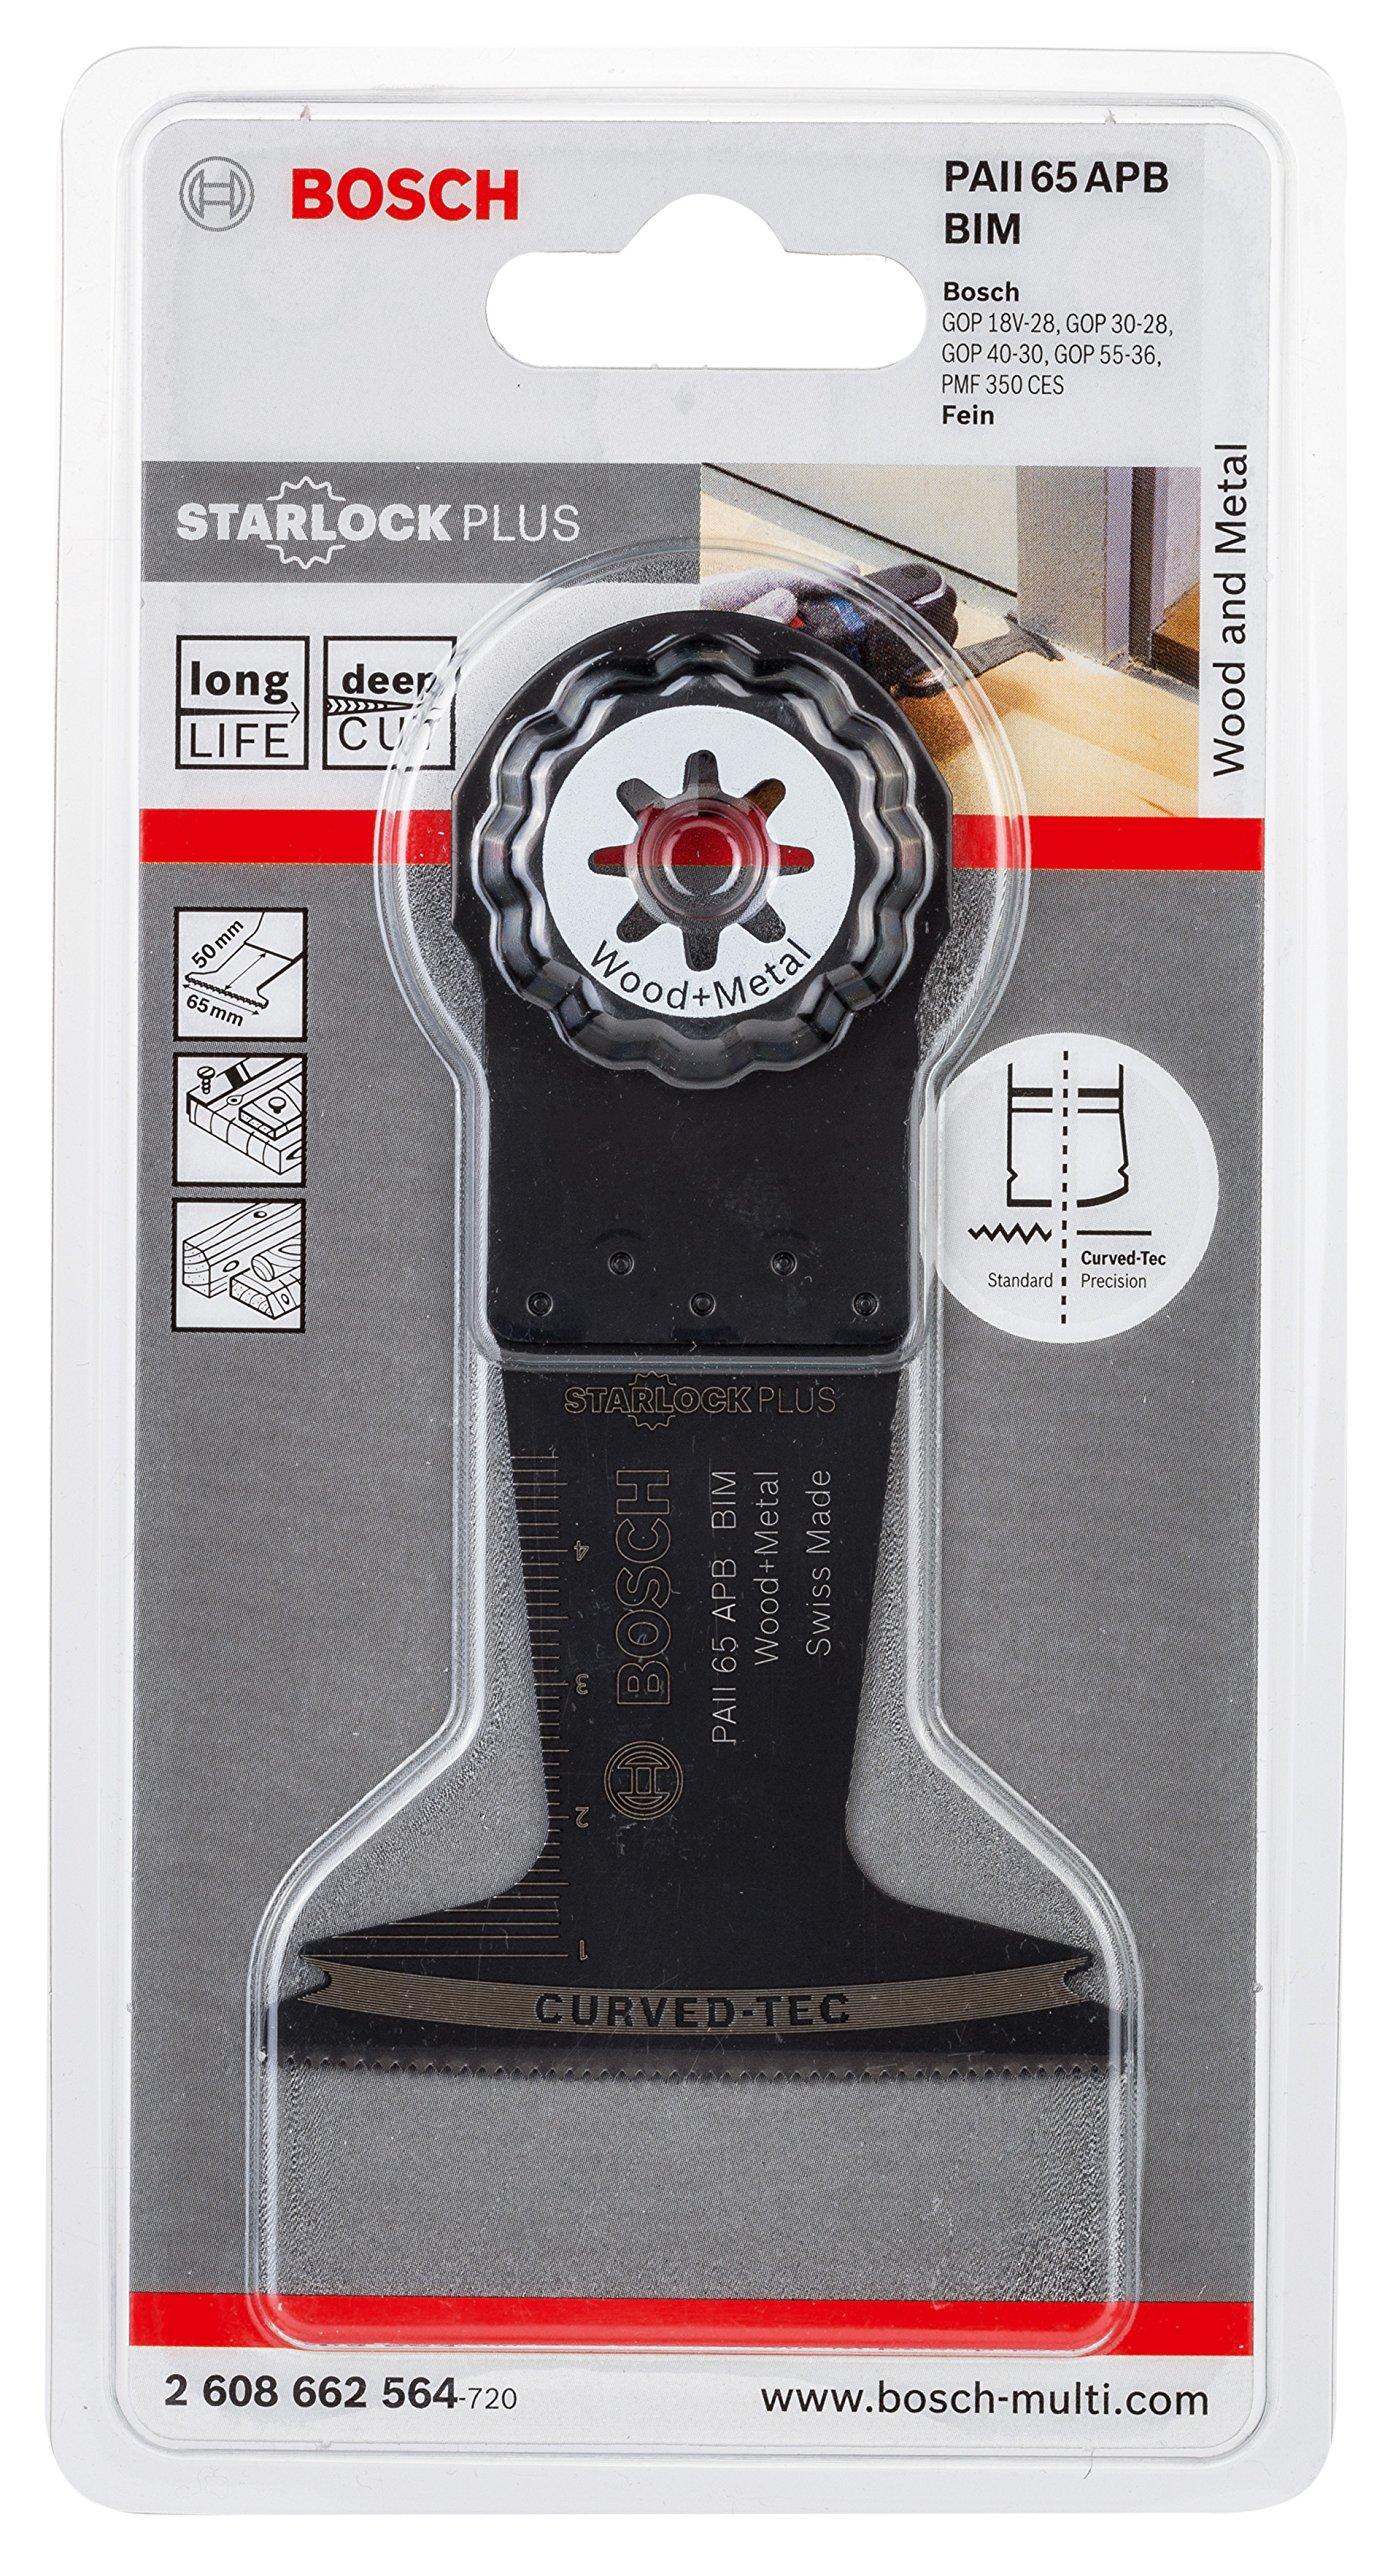 Bosch Starlock Oscillating Multi Tool 2608662564 Plunge Cut Saw Blade ''Paii 65 Apb'' of Bi-Metal by Bosch (Image #2)